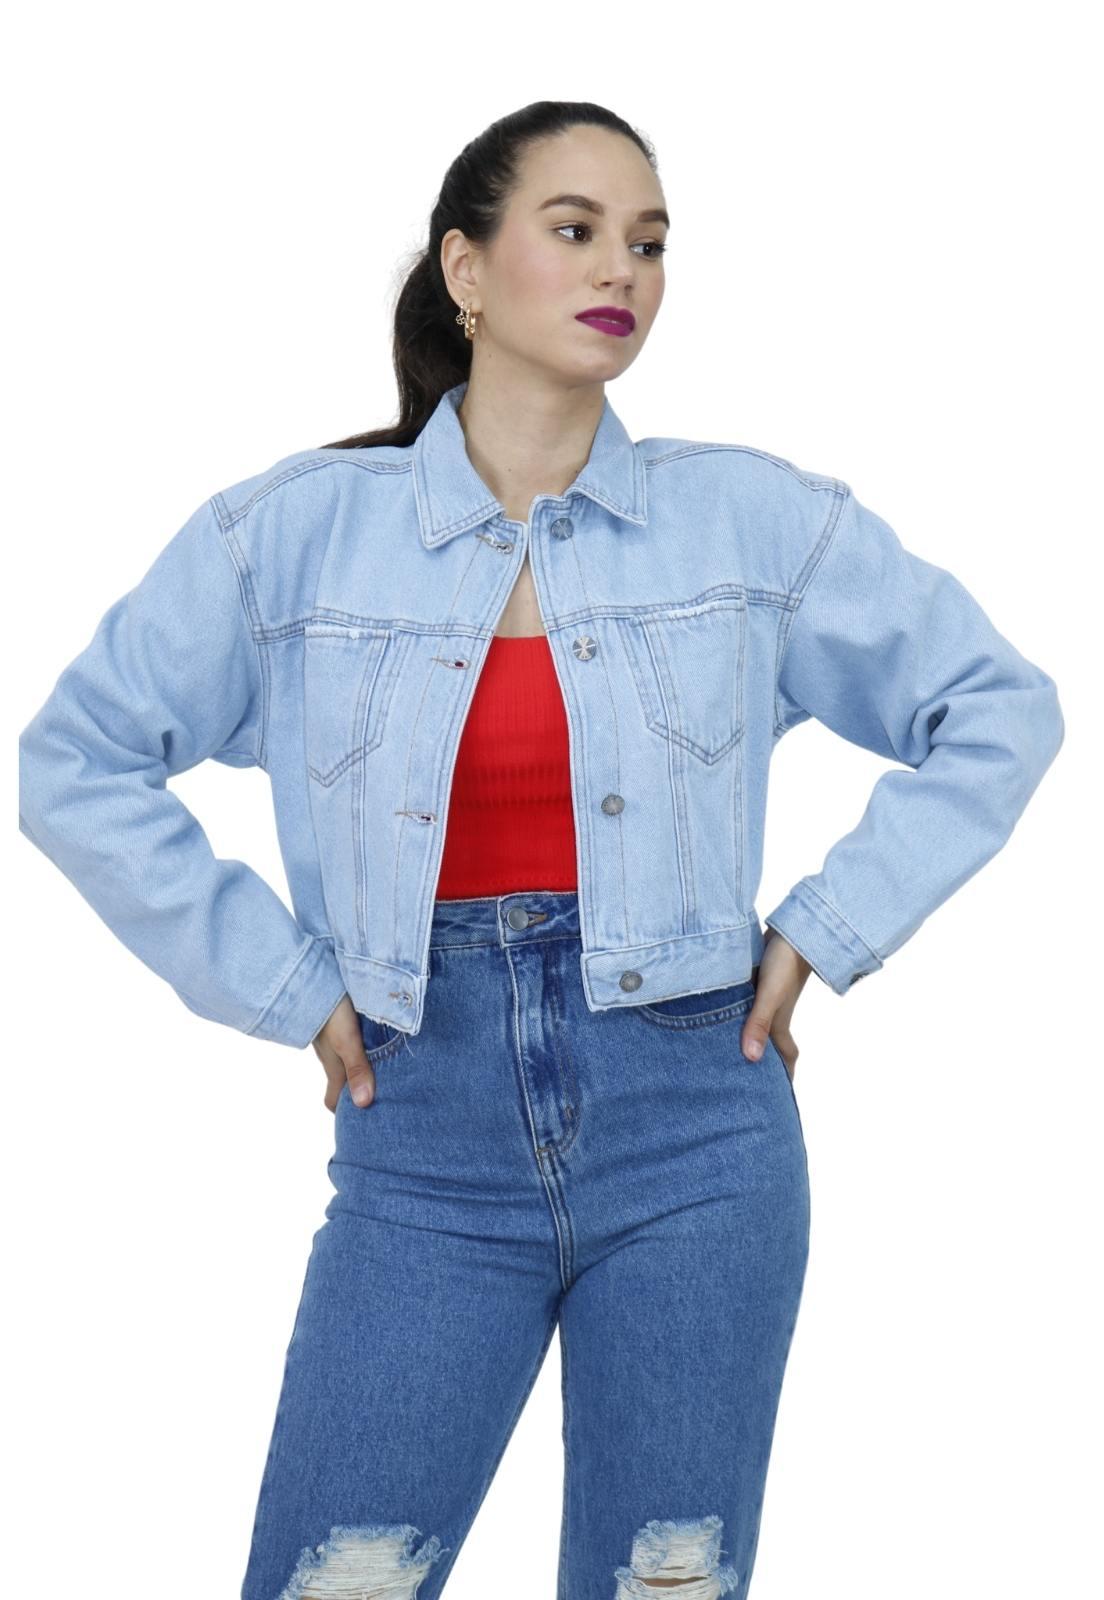 Jaqueta Feminina Cropped Jeans Claro Botões